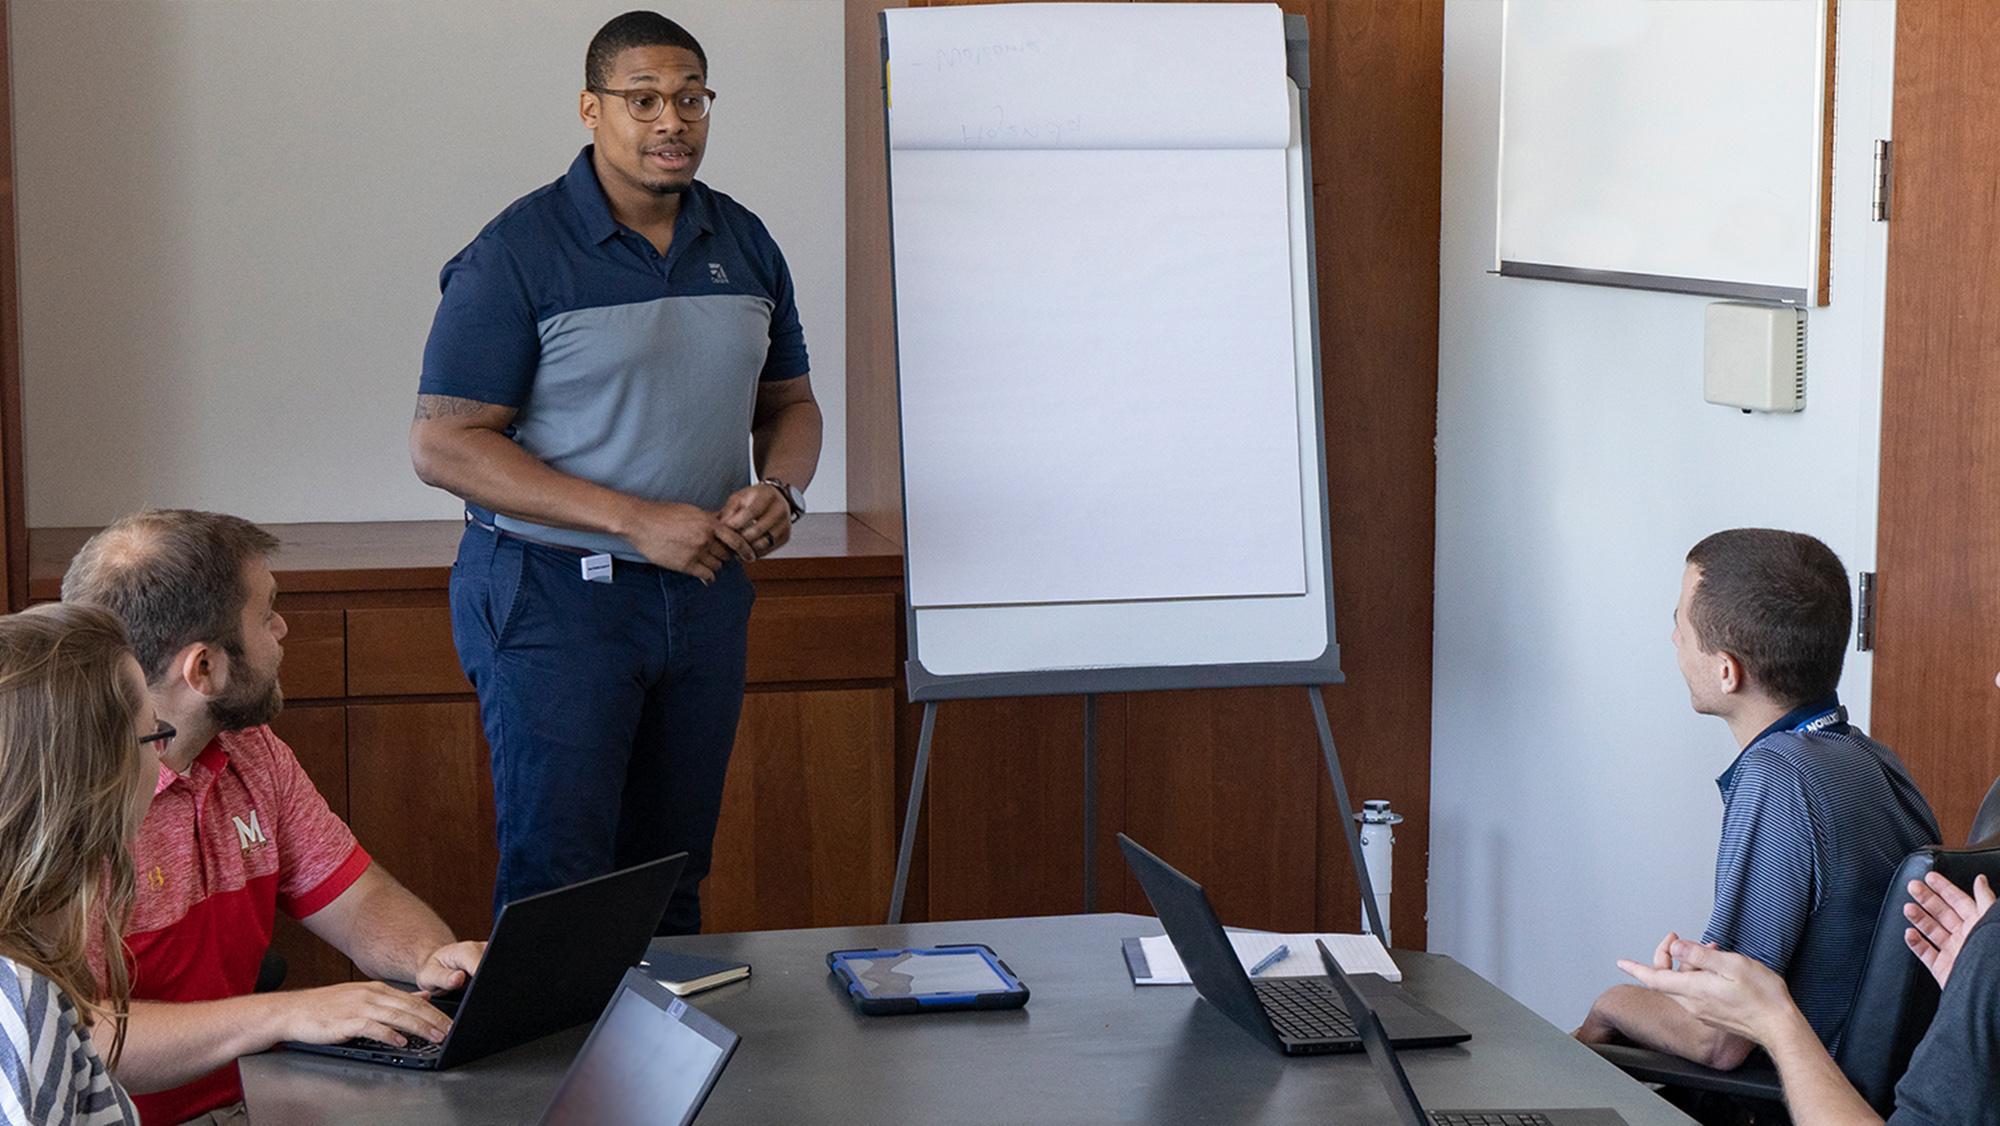 employee giving presentation